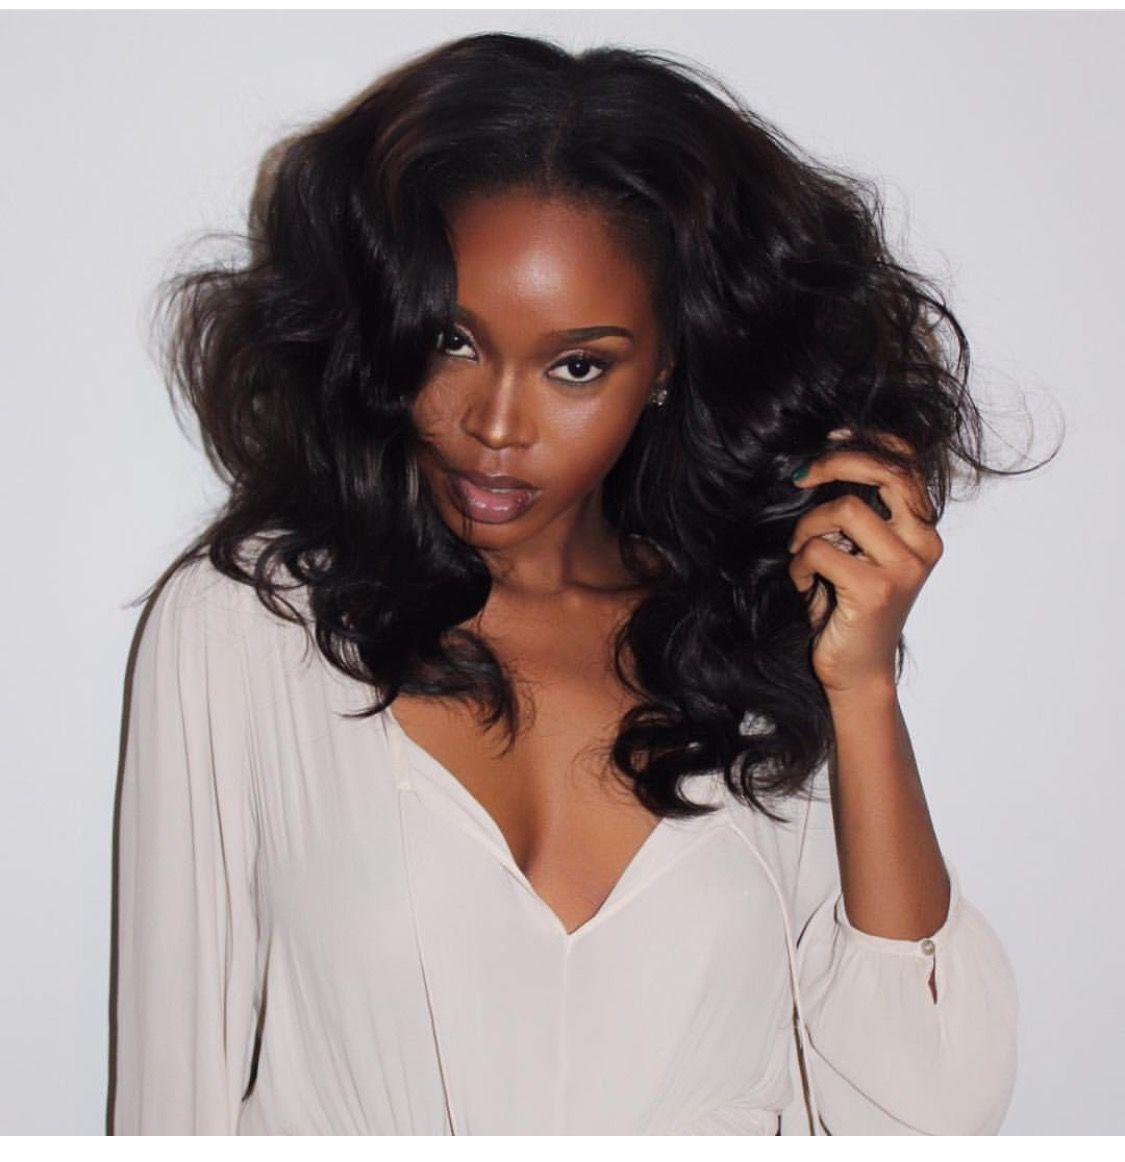 Follow for more trendy pins jacoleking womensbeauty hair